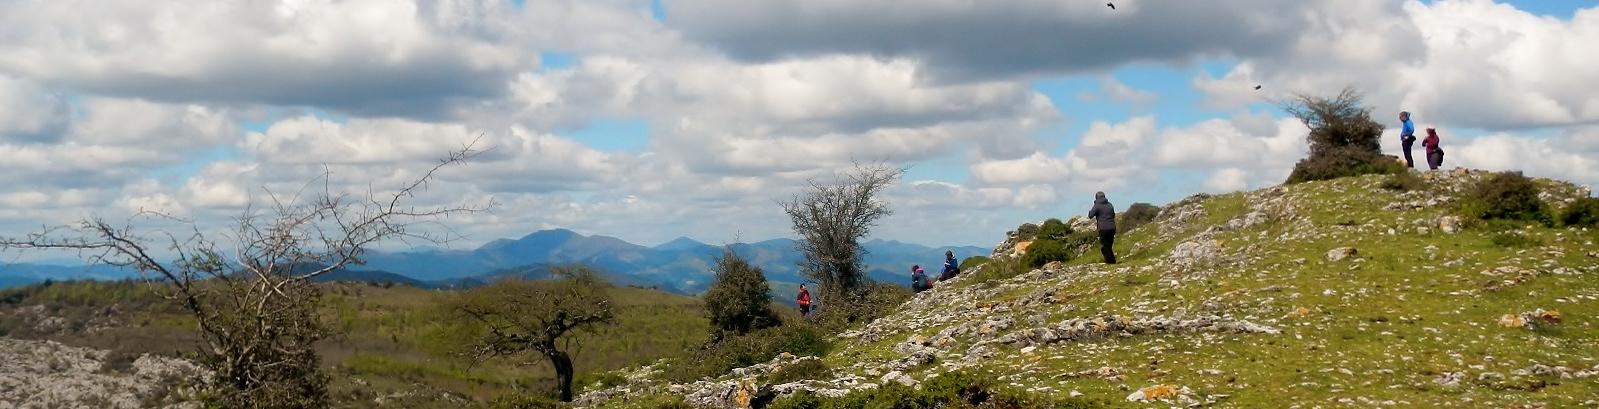 Senderismo en el País Vasco